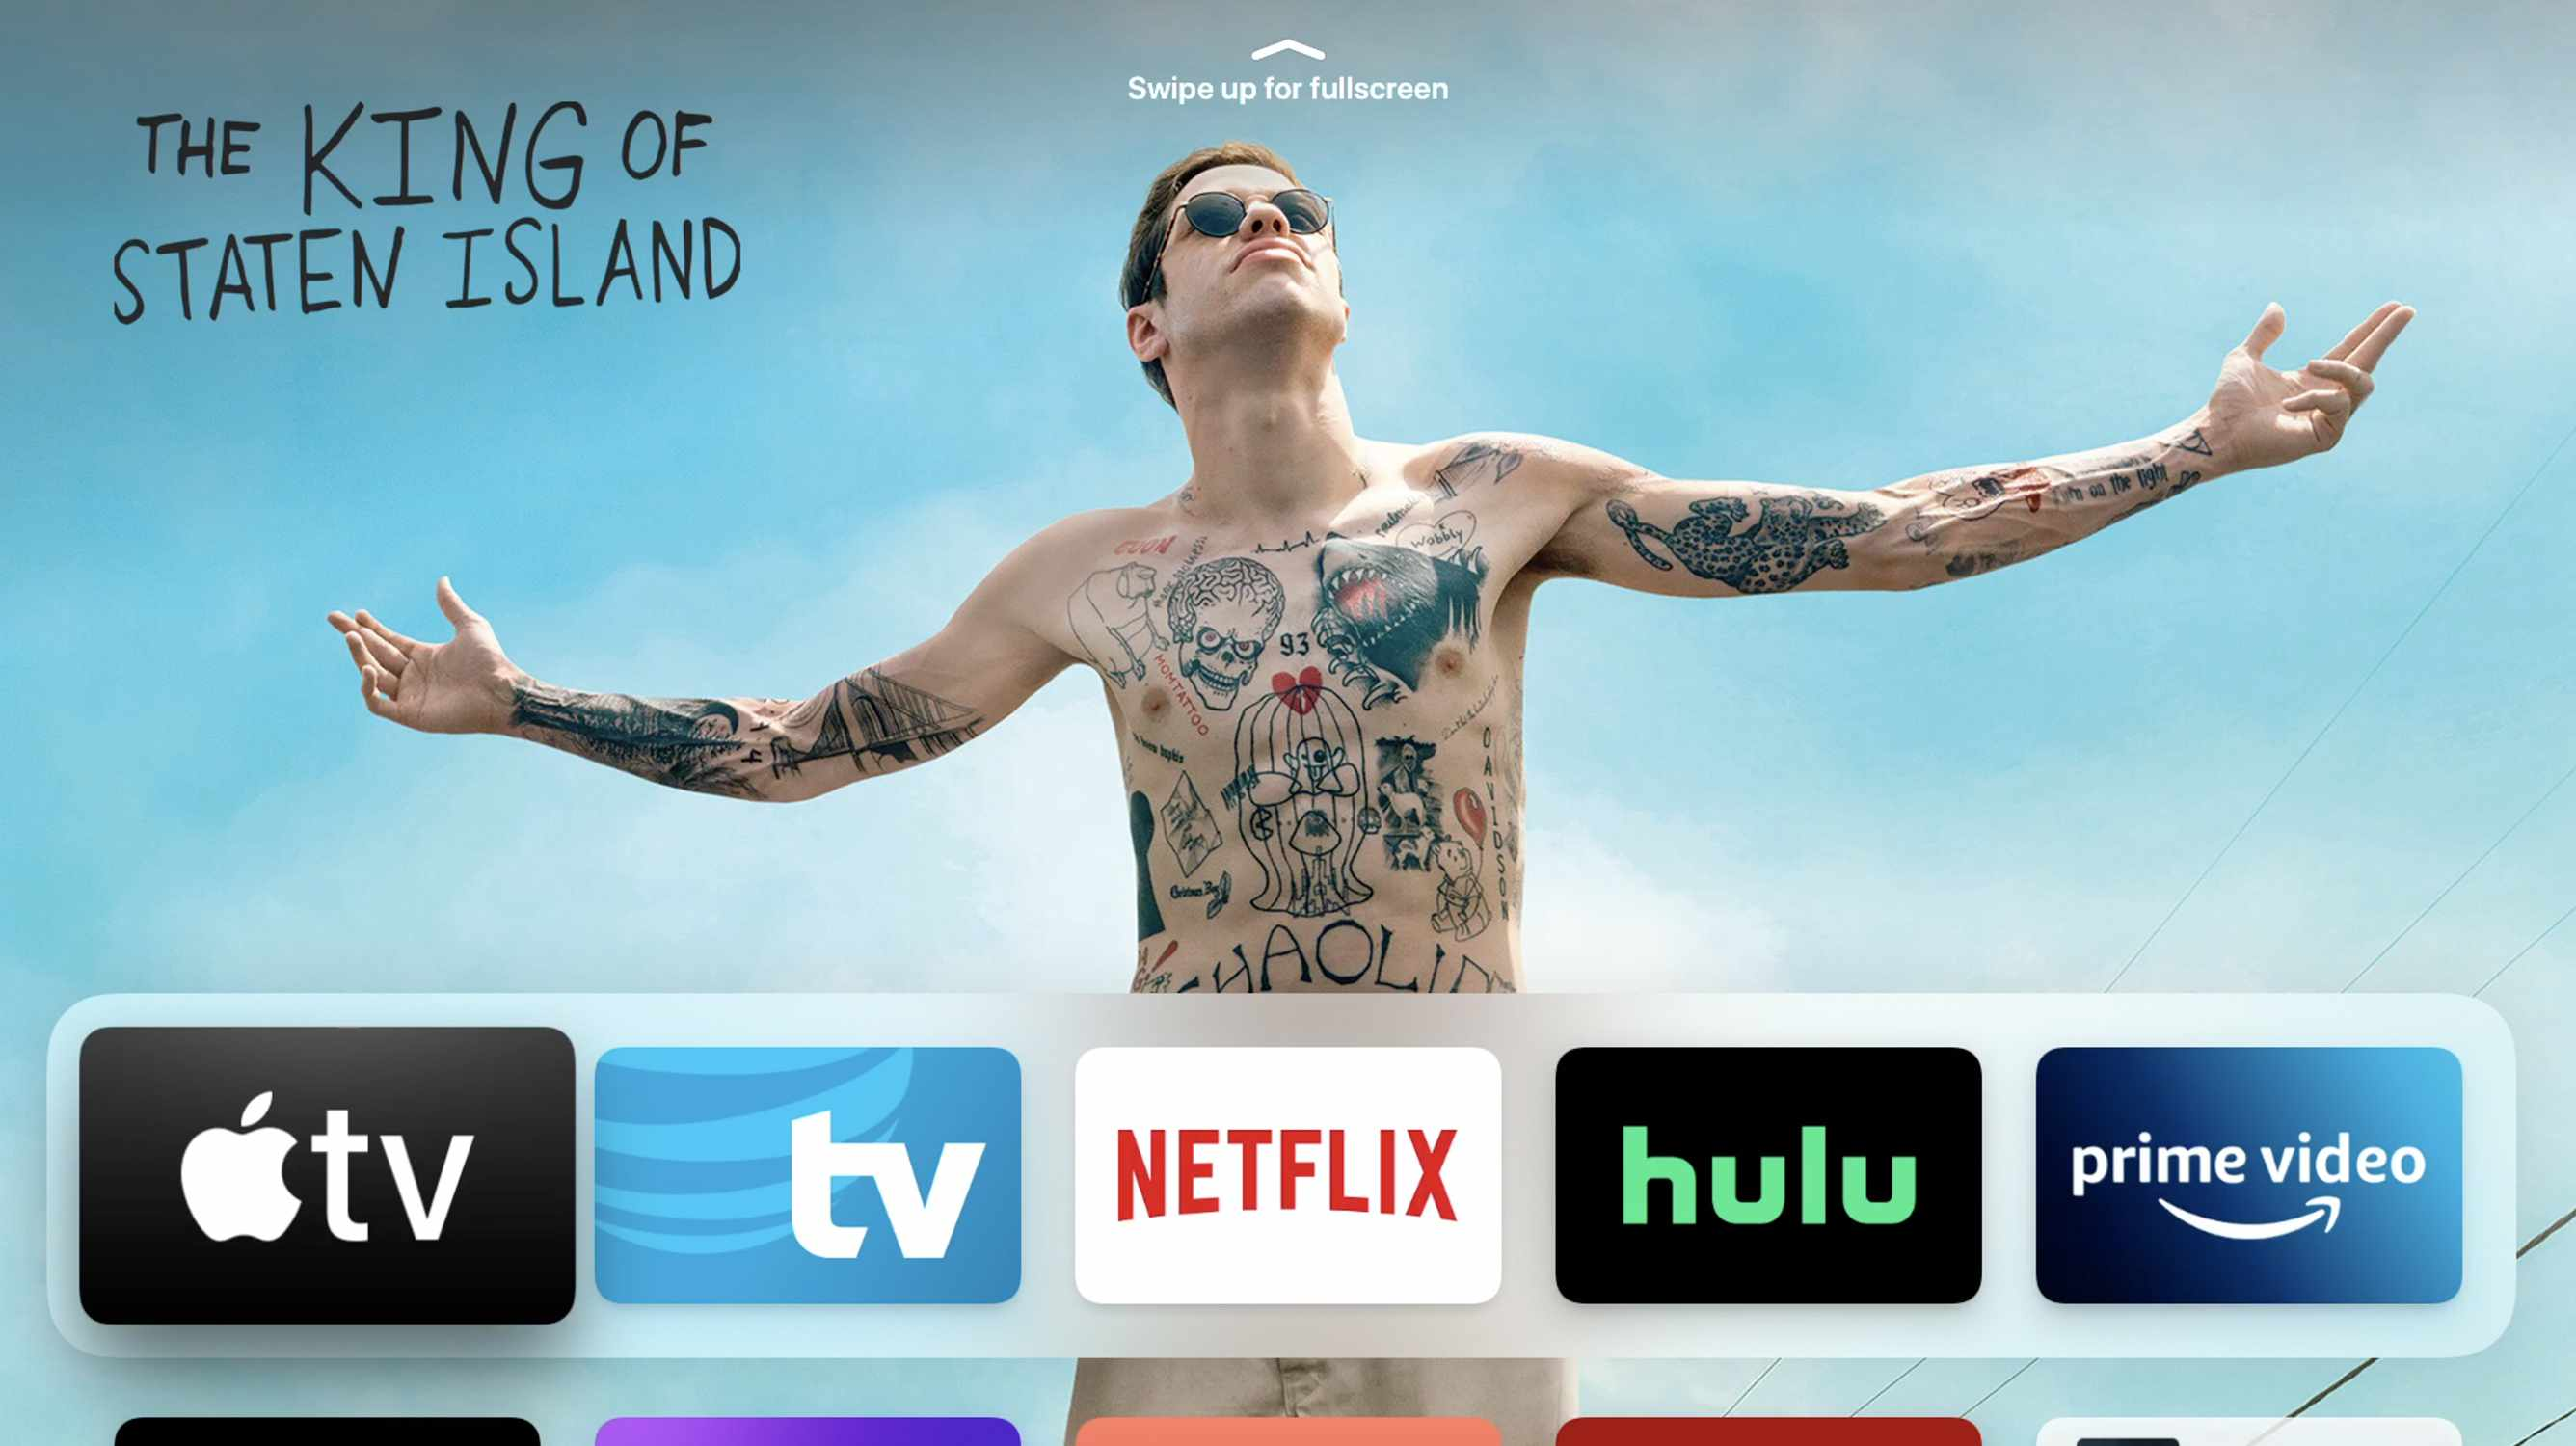 Screenshot of Apple TV homescreen